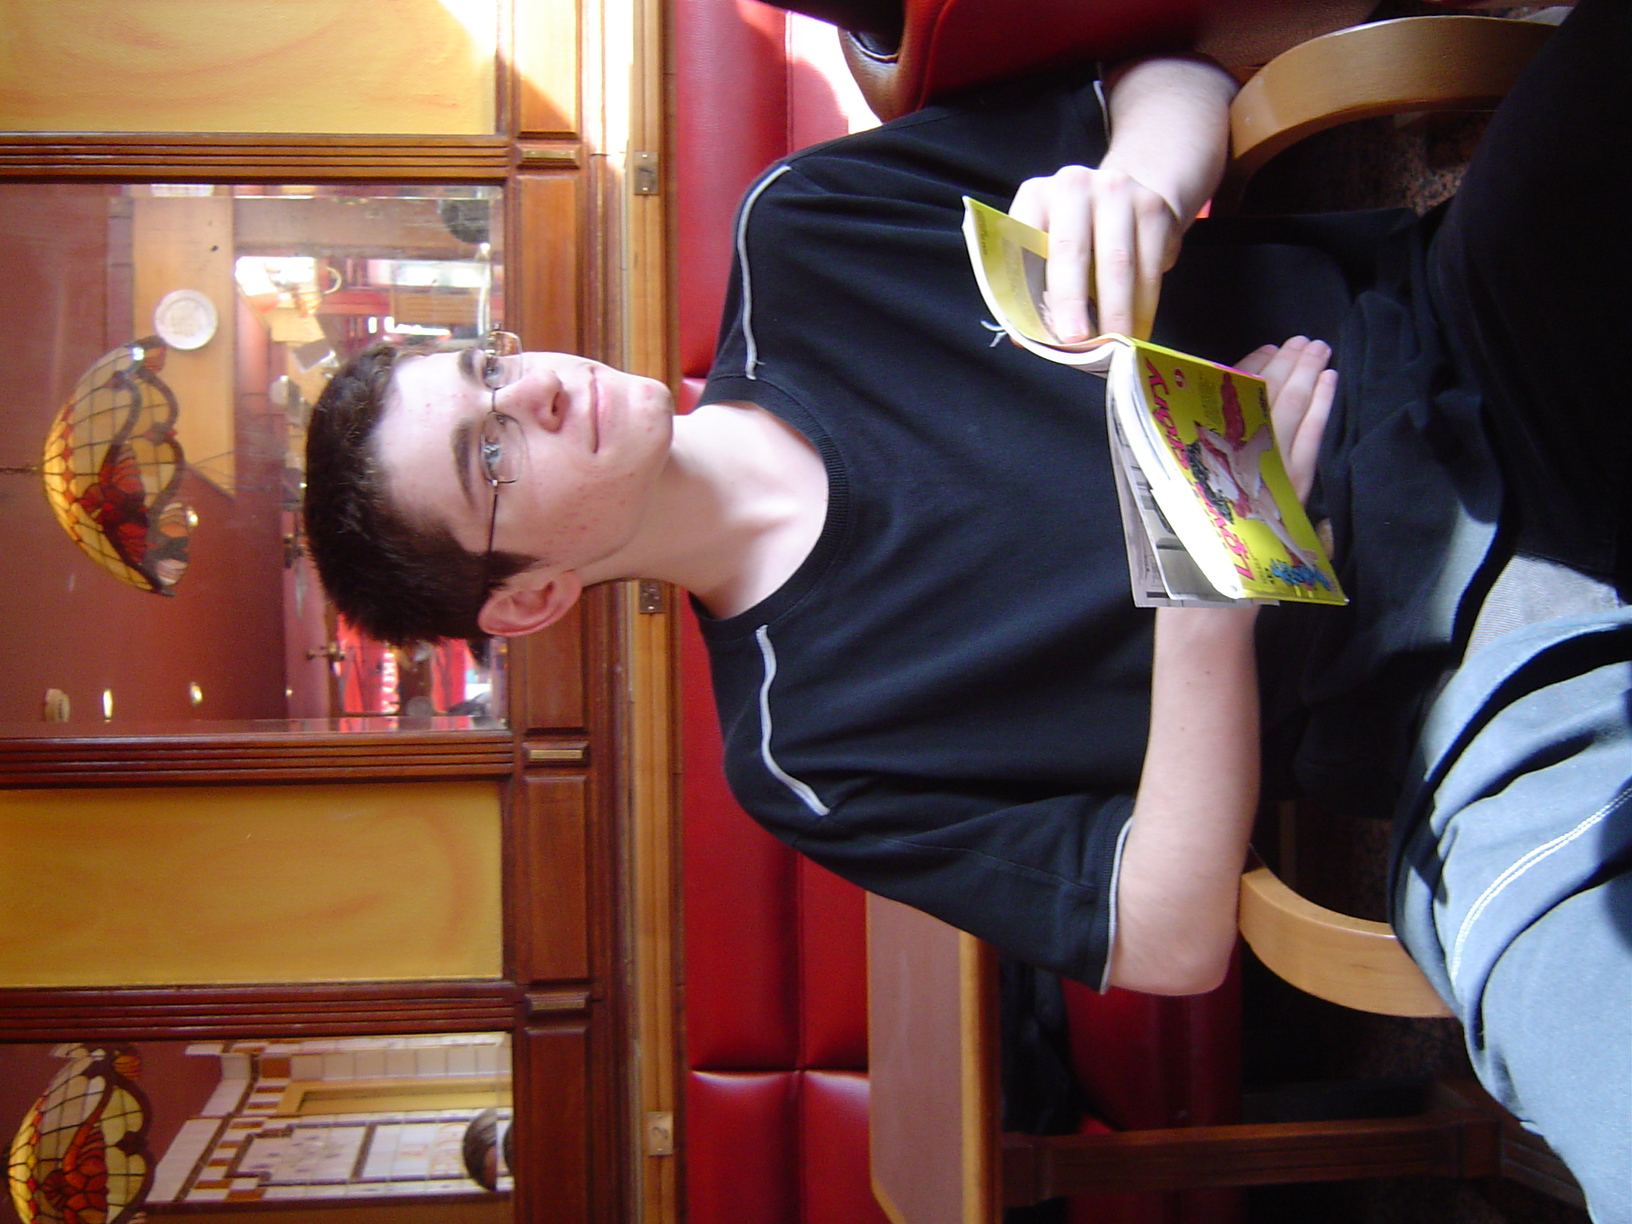 Photo 29 - Tom en pleine lecture